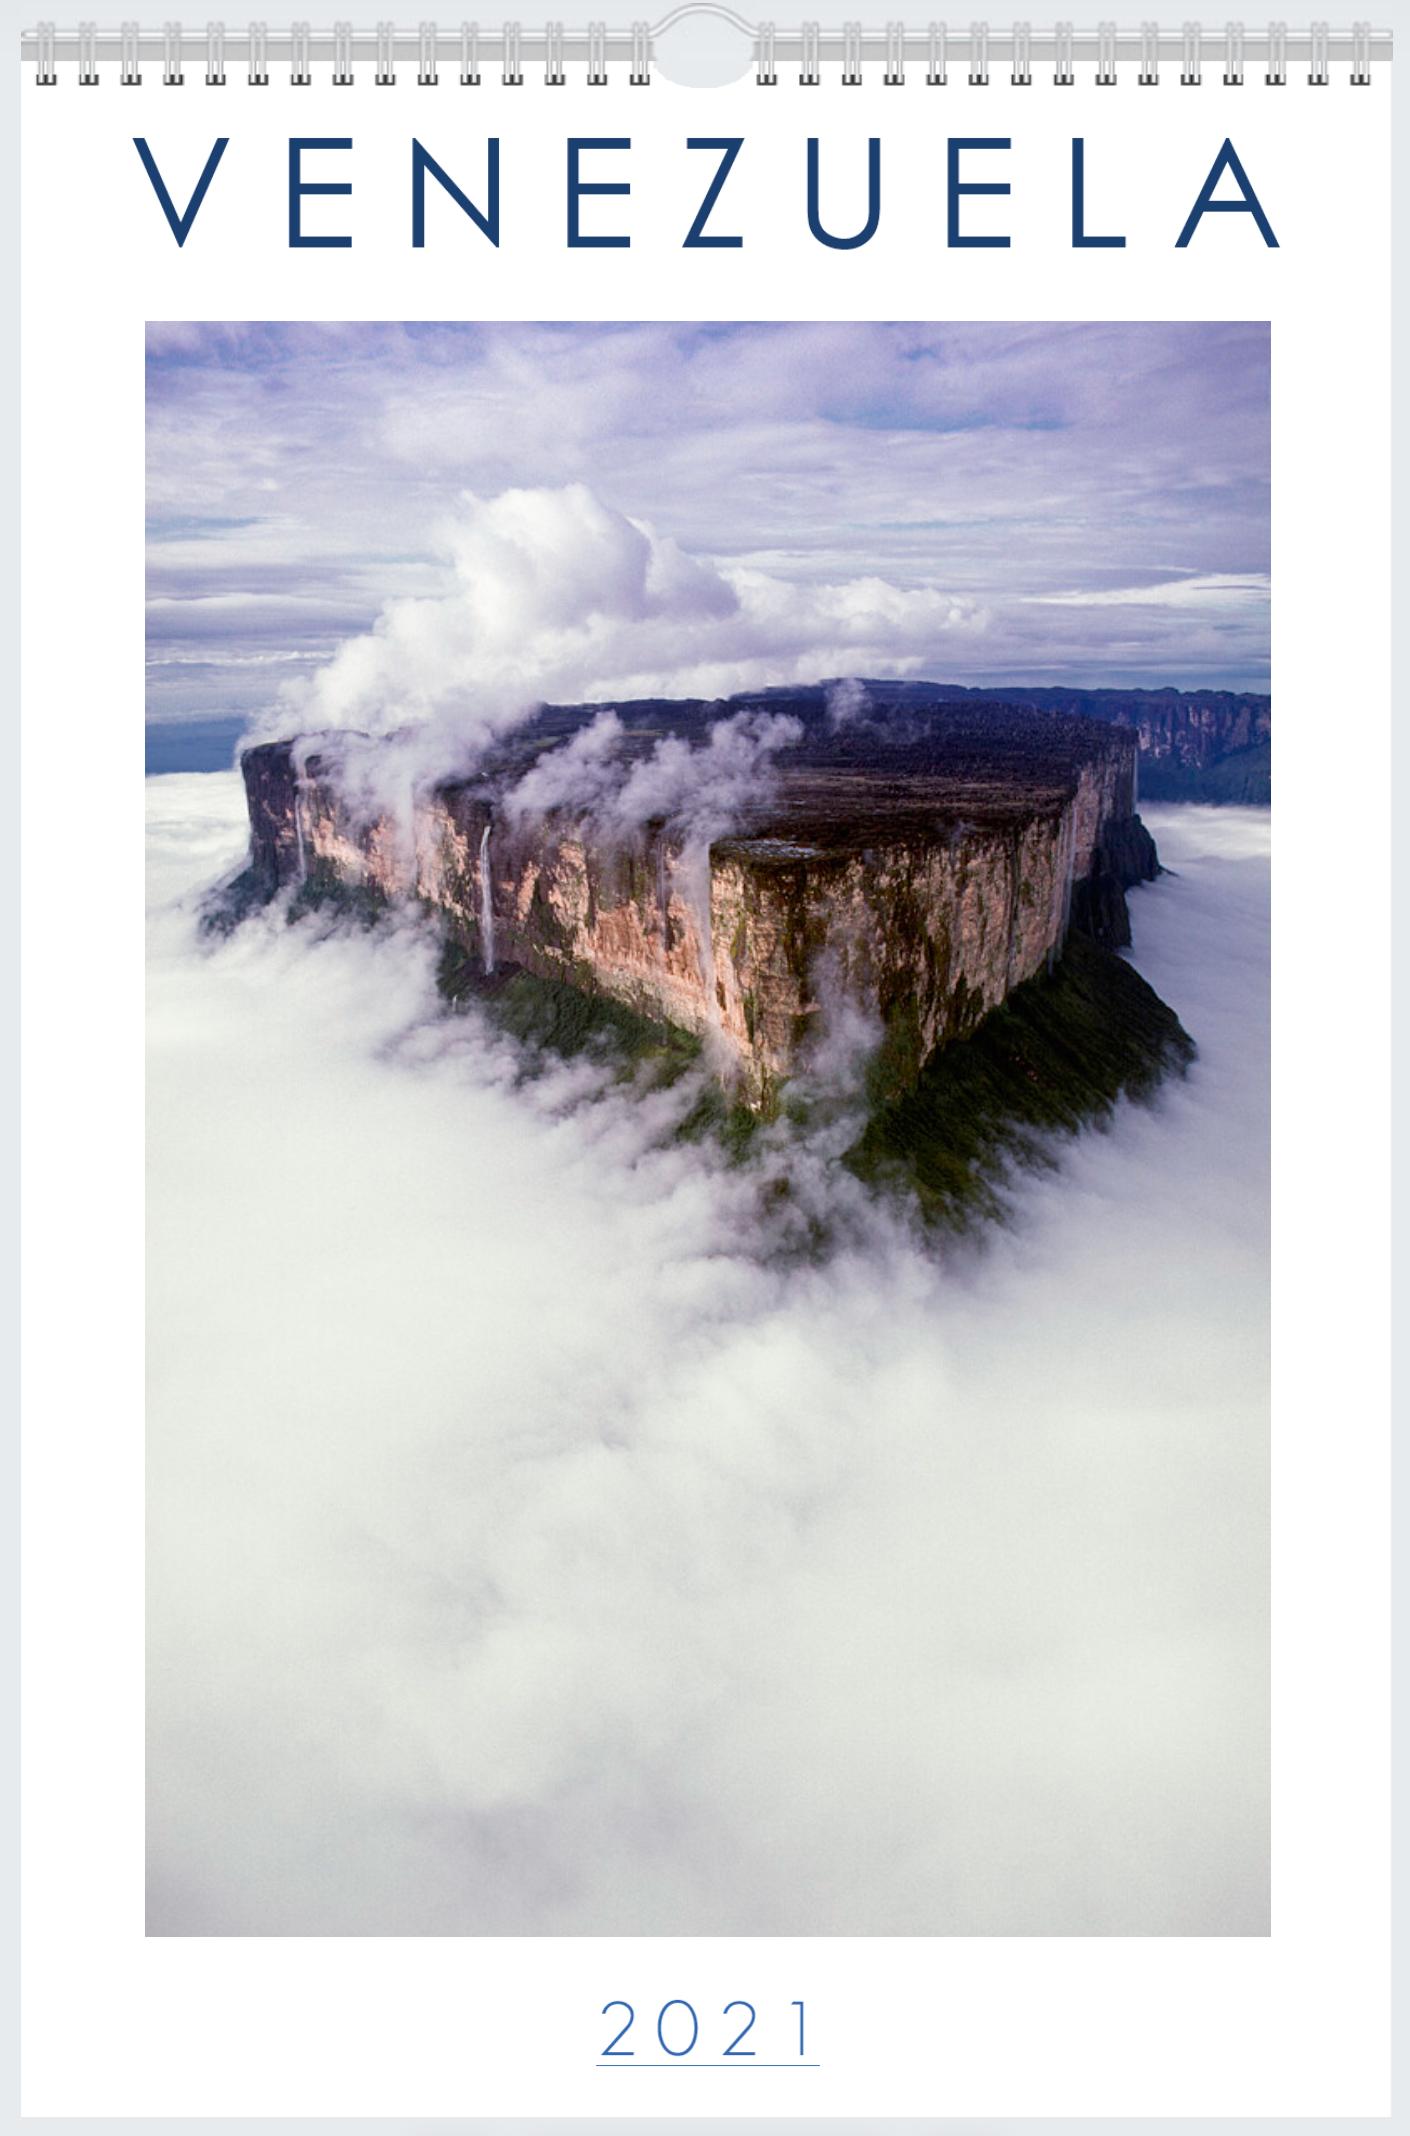 1-Venezuela Cover_12x18.png